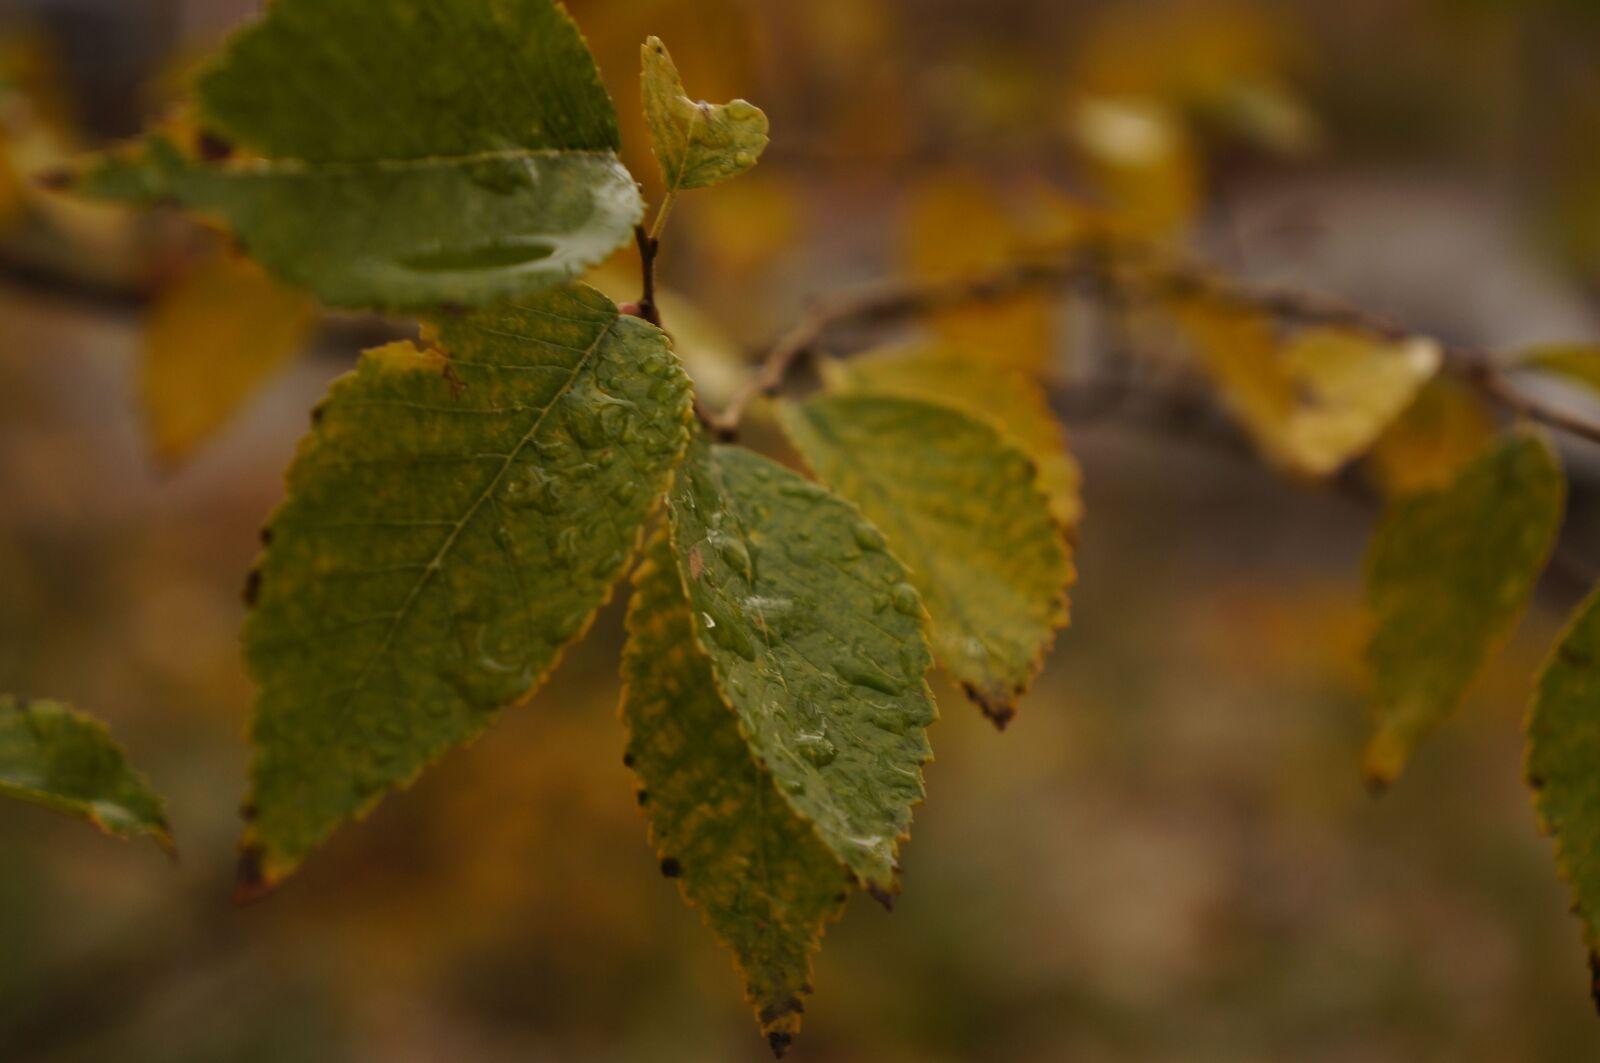 autumn, leaves, yellow